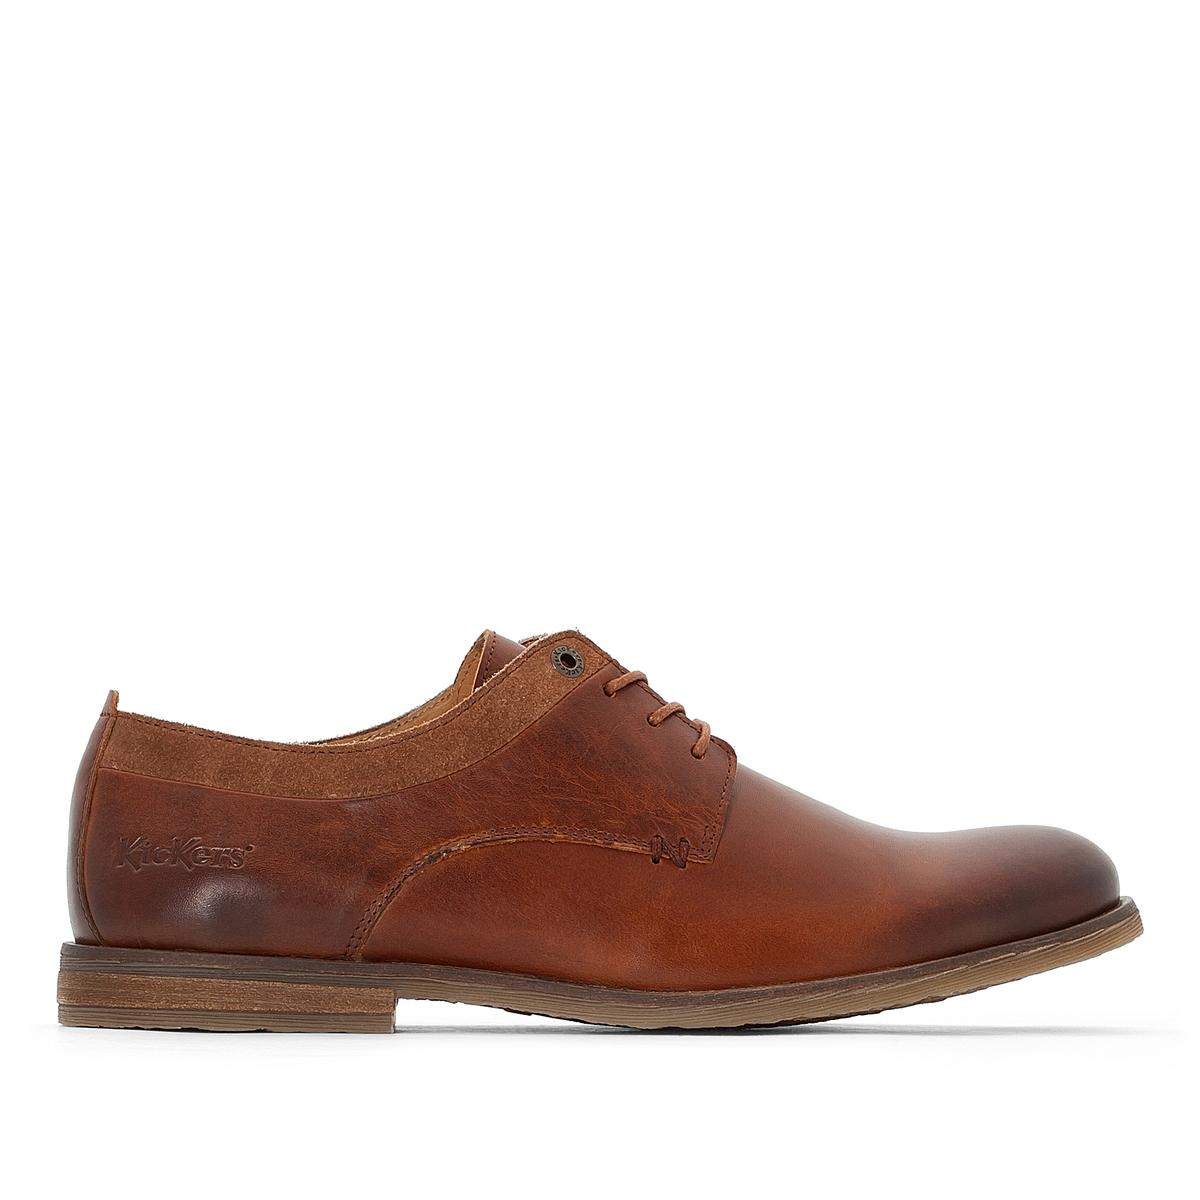 Ботинки-дерби Flaveston